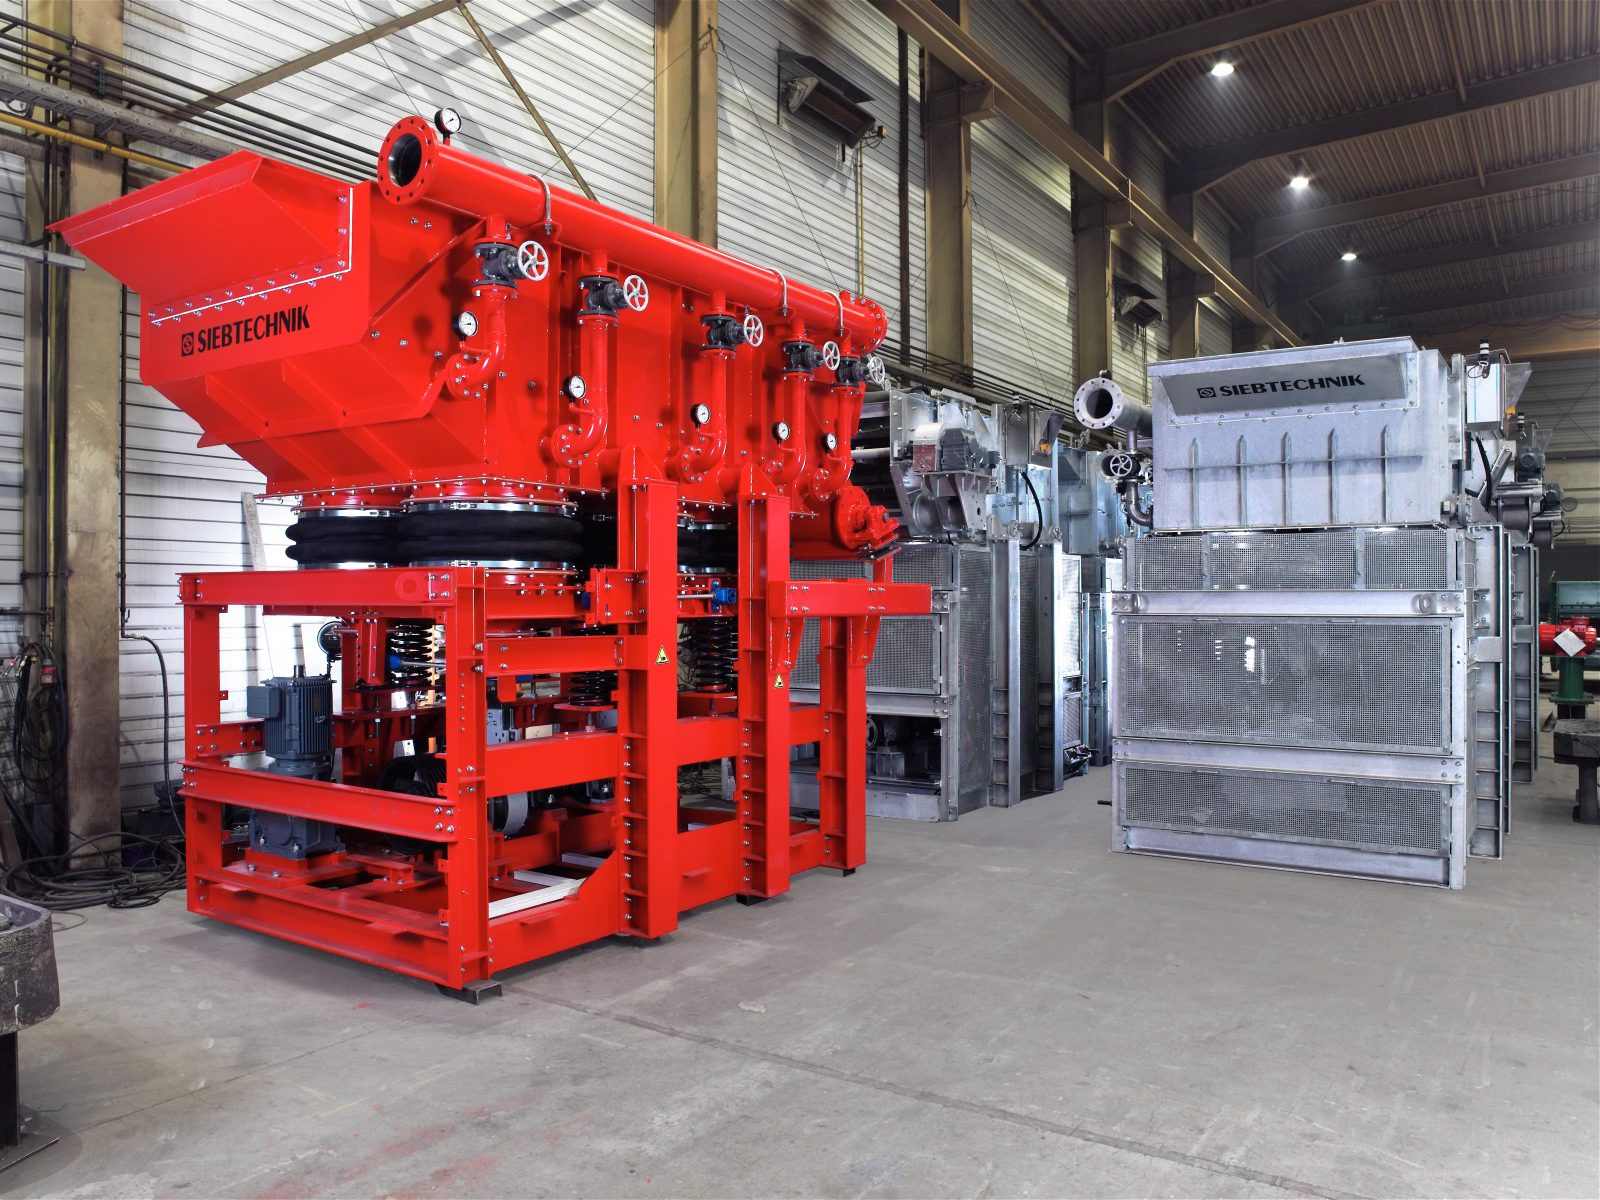 Pulsator jig SK 16-33 for ore & Pulsator jig SK 16-25 (galvanized) for gravel